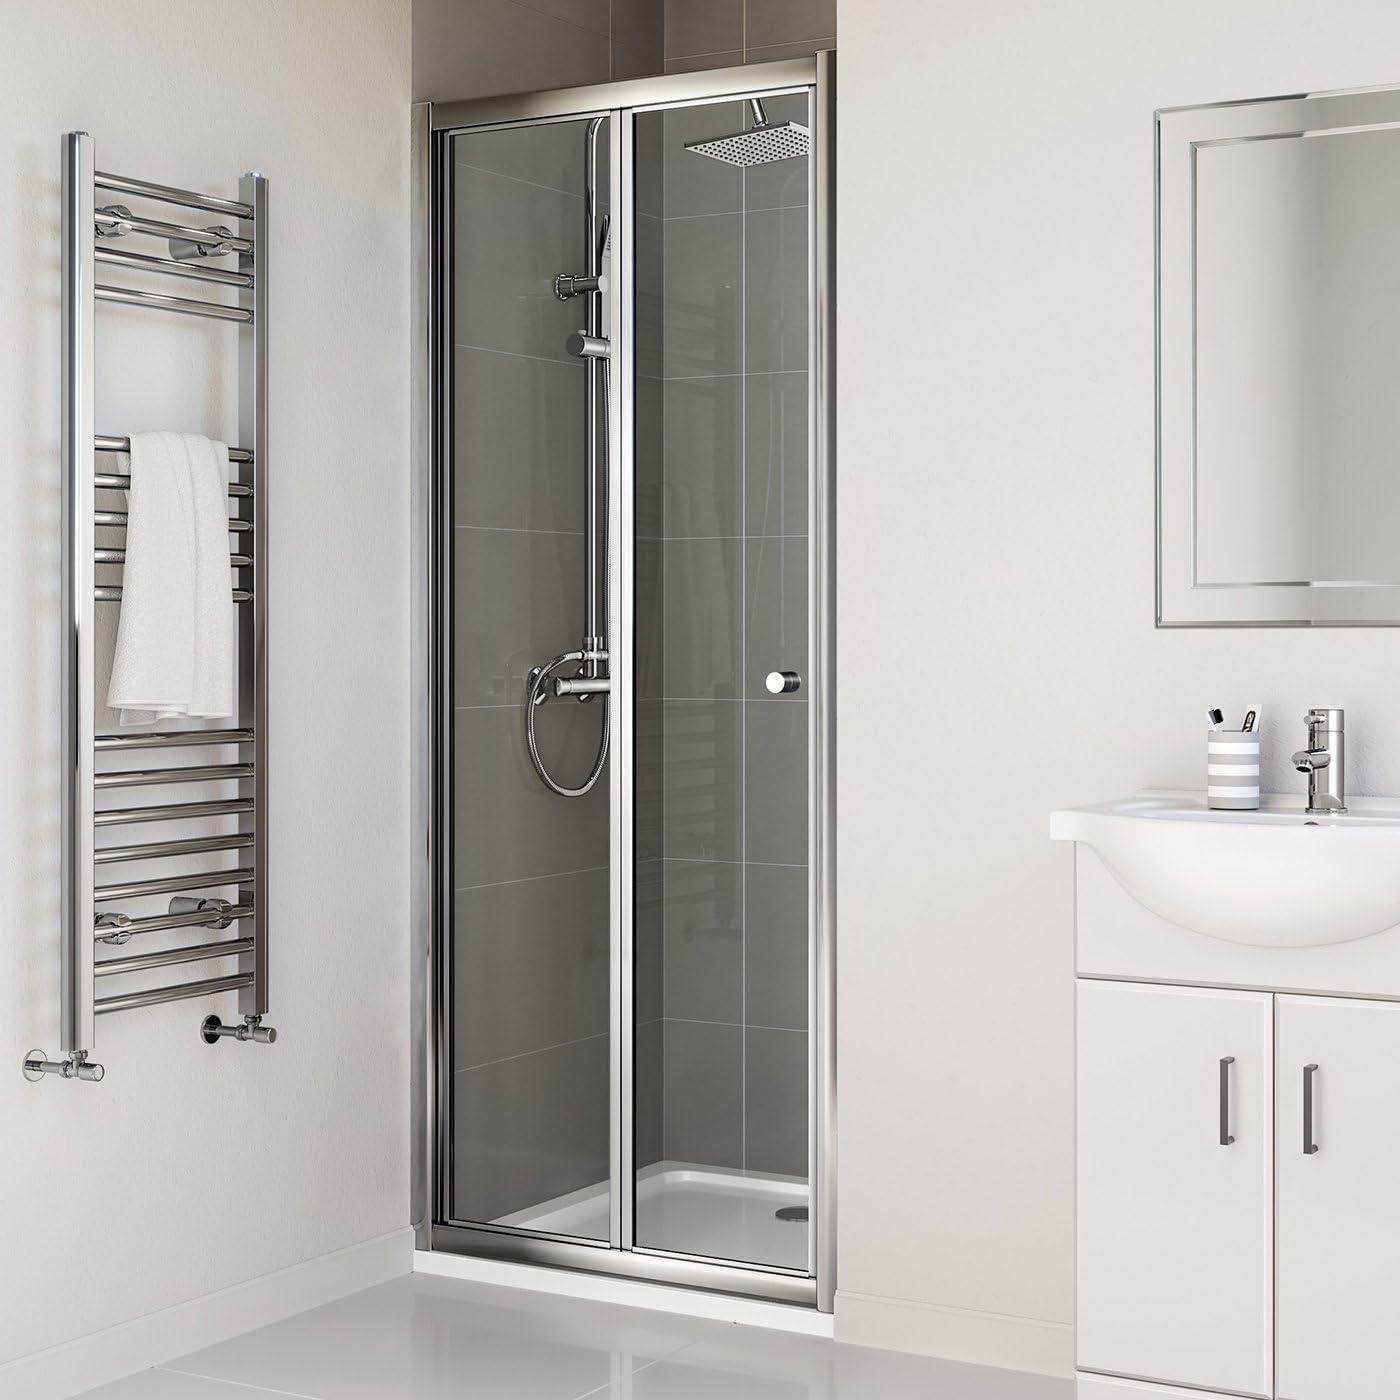 iBathUK 760mm Bifold Glass Shower Enclosure Reversible Folding Cubicle Door